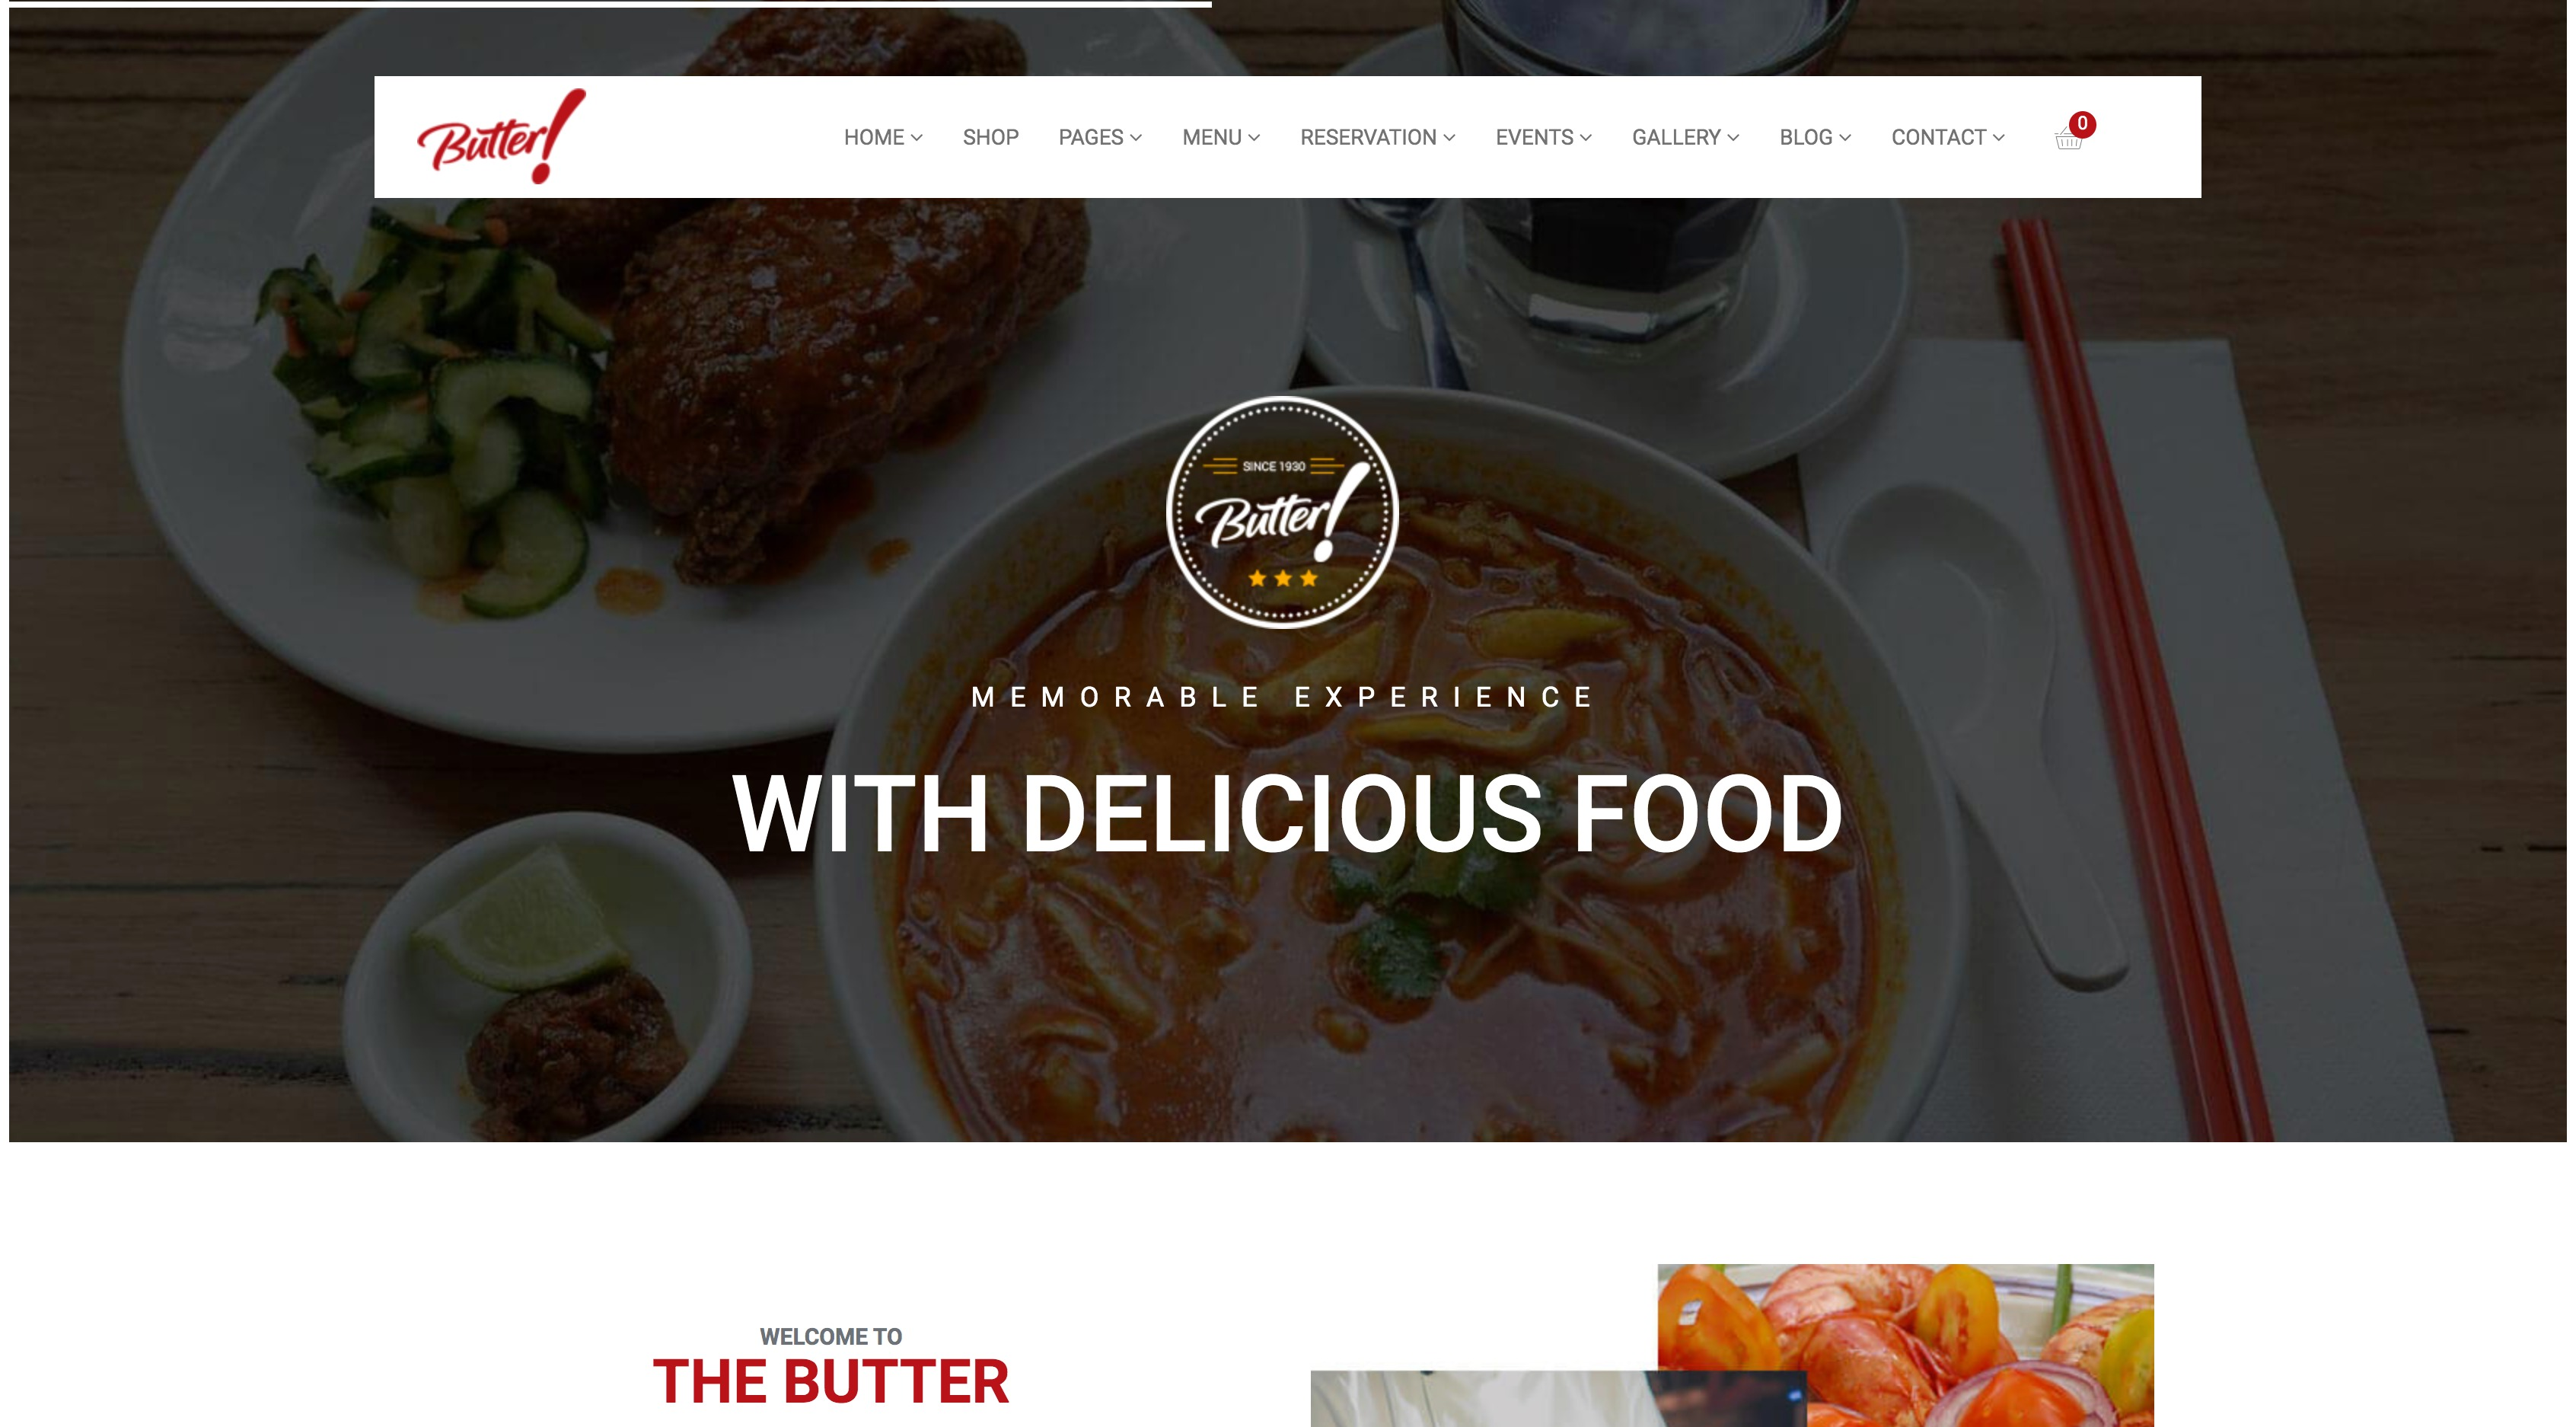 Butter-餐厅菜单面包咖啡比萨WordPress主题